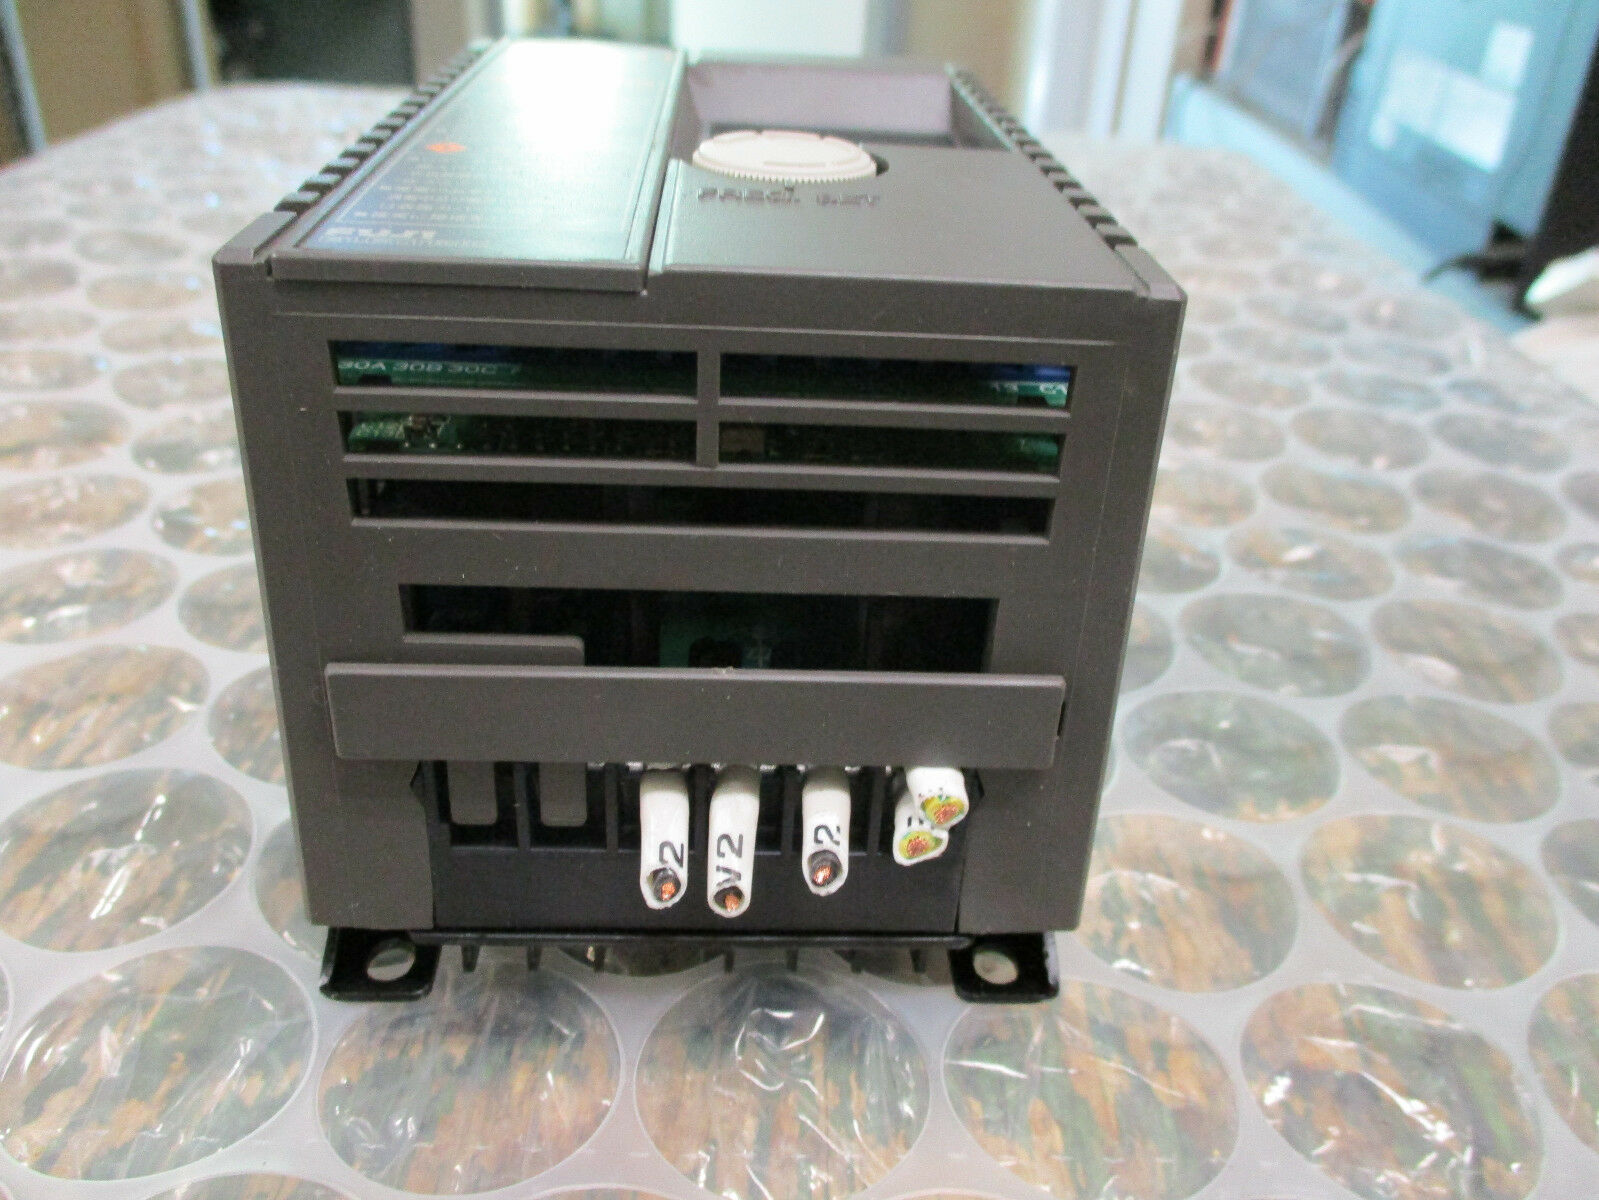 Fuji Electric Fvro.1c11s-2 FVRO1C11S2 Variable Frequency Drive Inverter    eBay